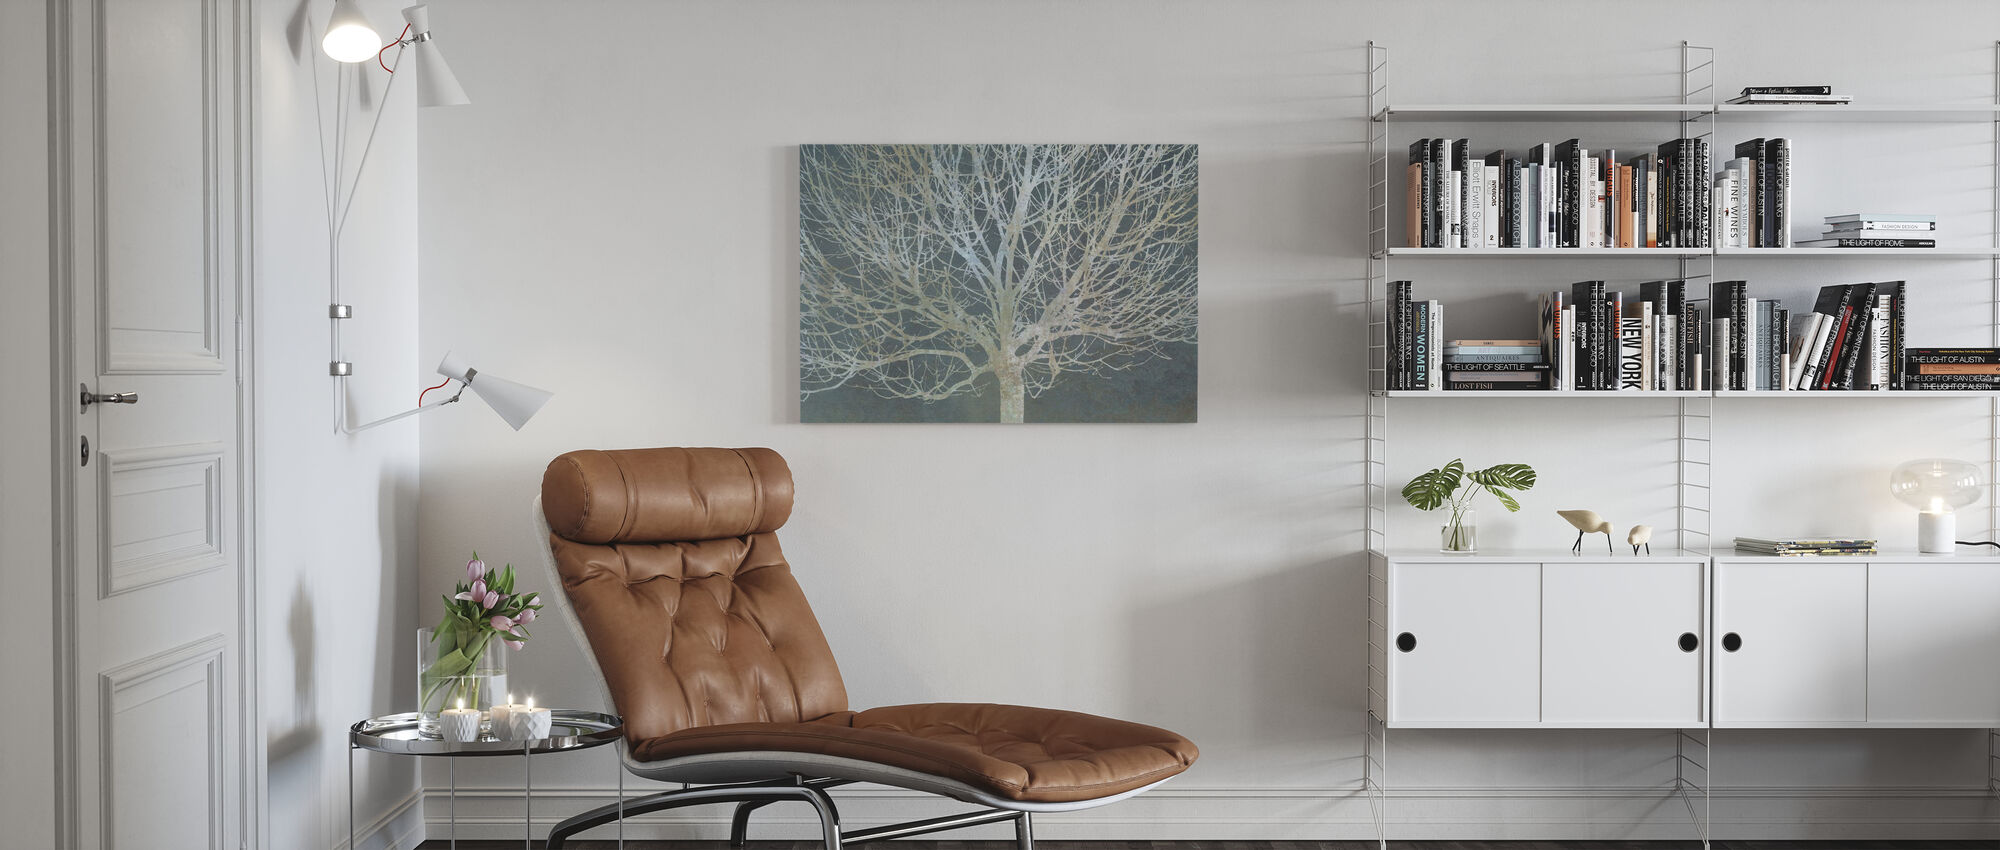 Silverträd - Canvastavla - Vardagsrum